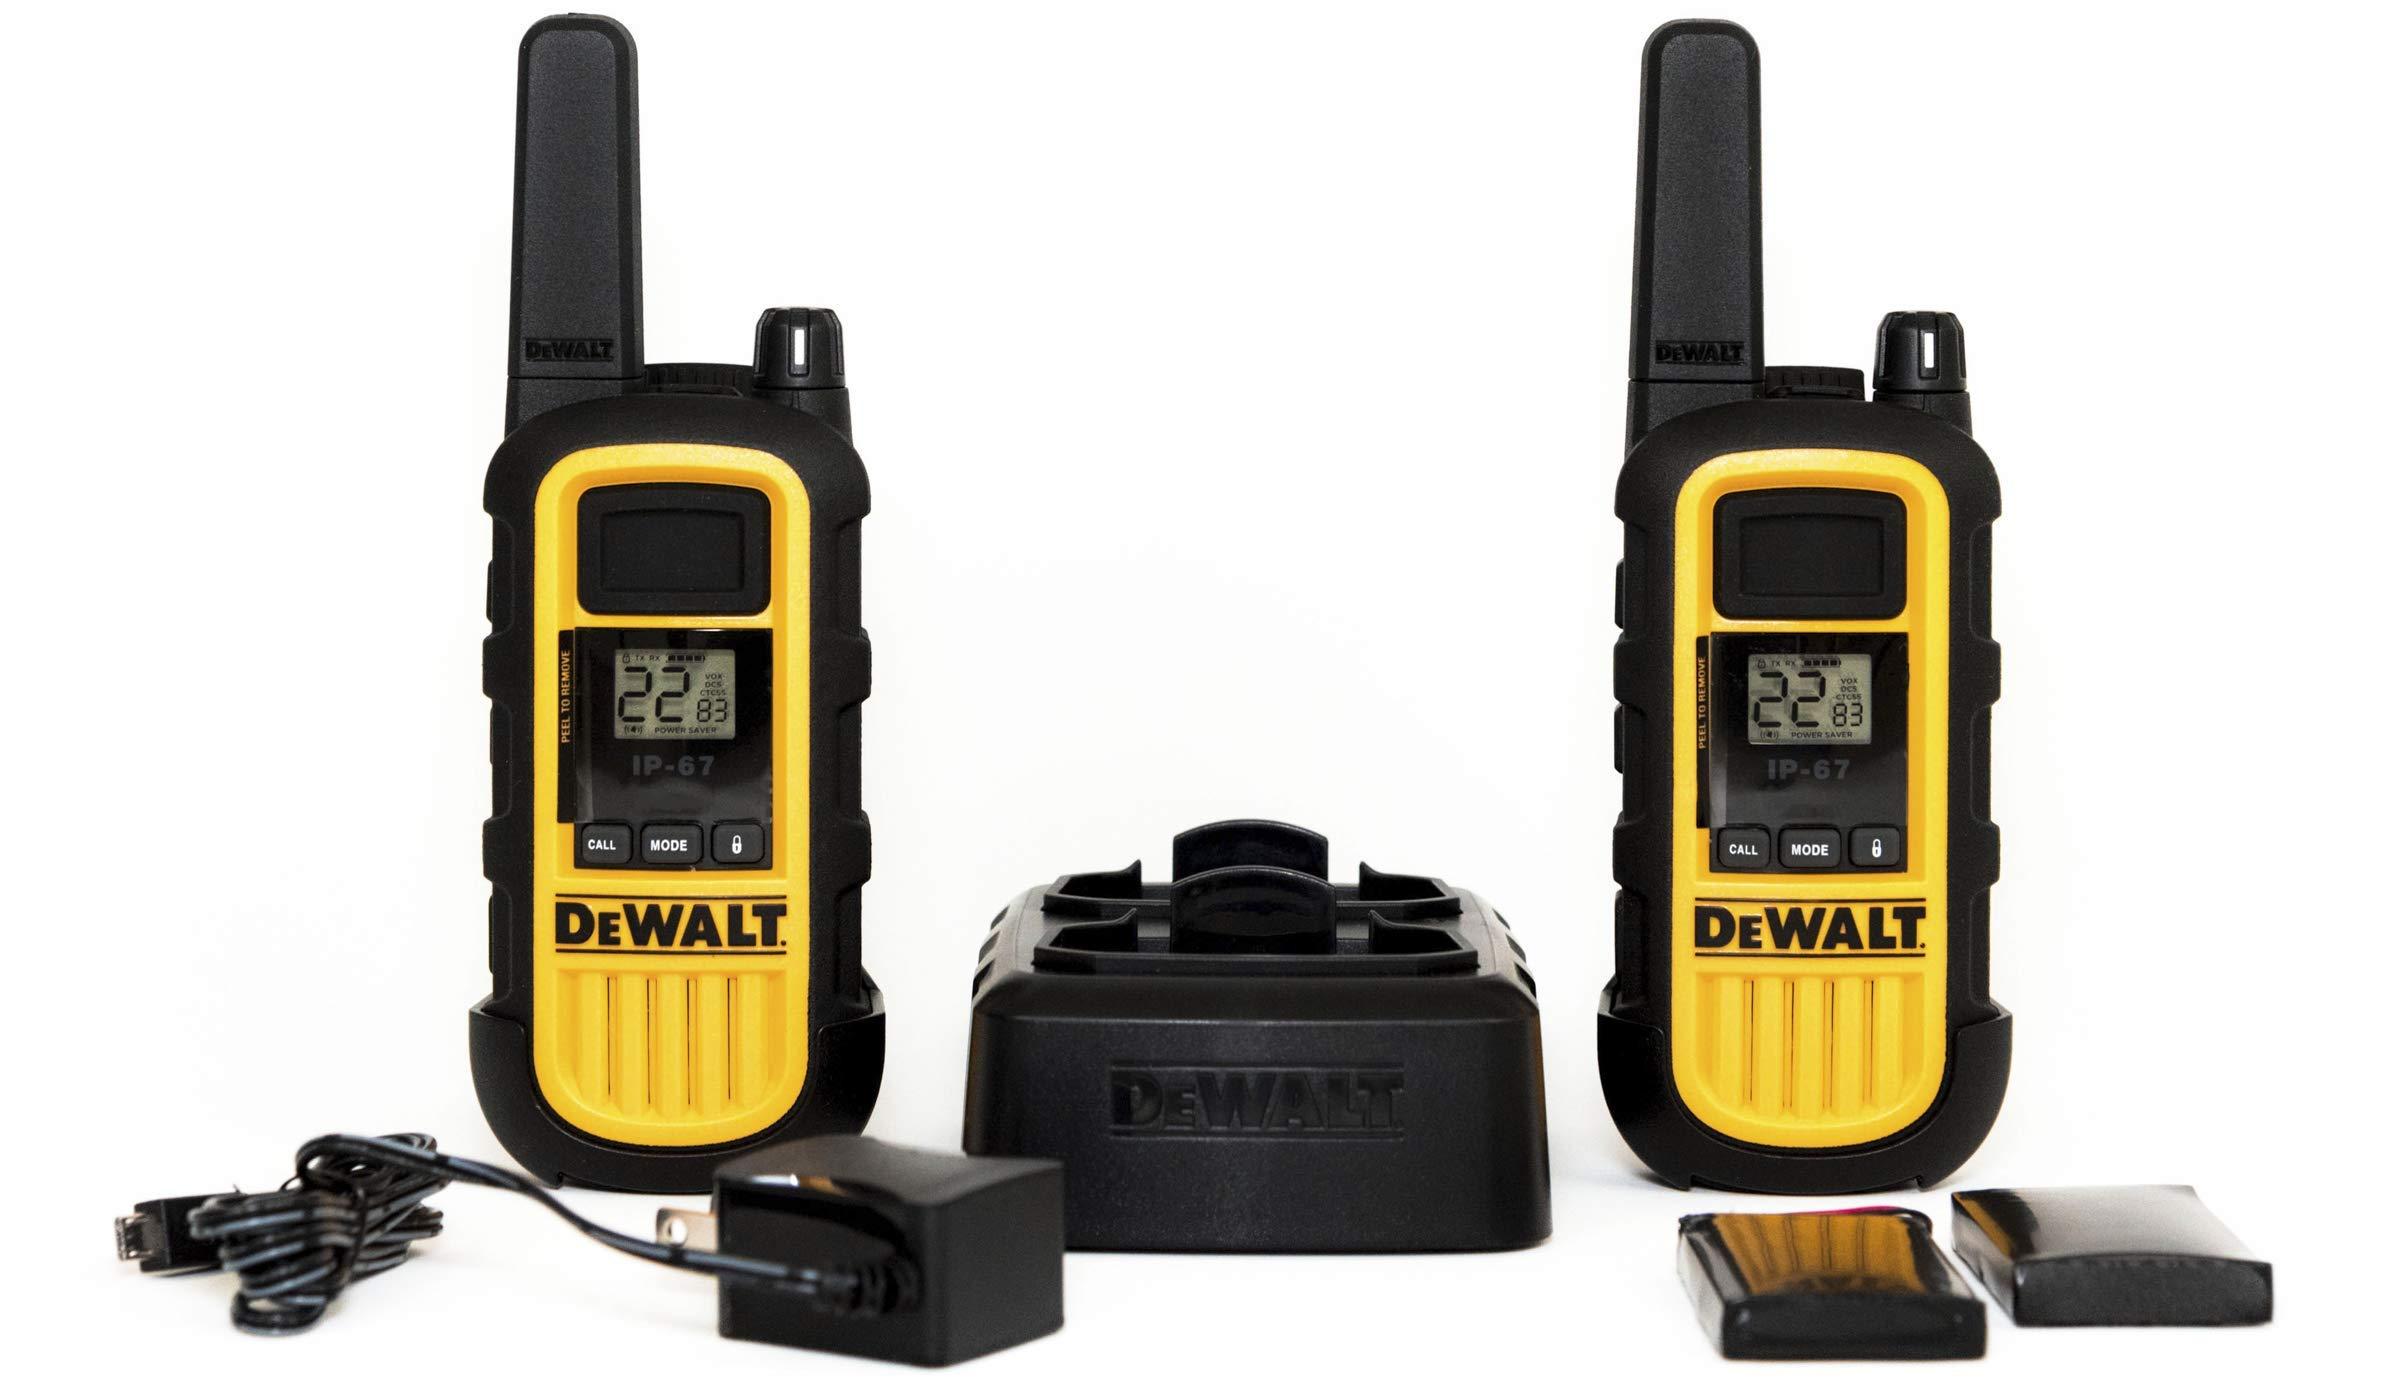 DEWALT DXFRS800 2W Walkie Talkies Heavy Duty Business Two-Way Radios (Pair) by DEWALT